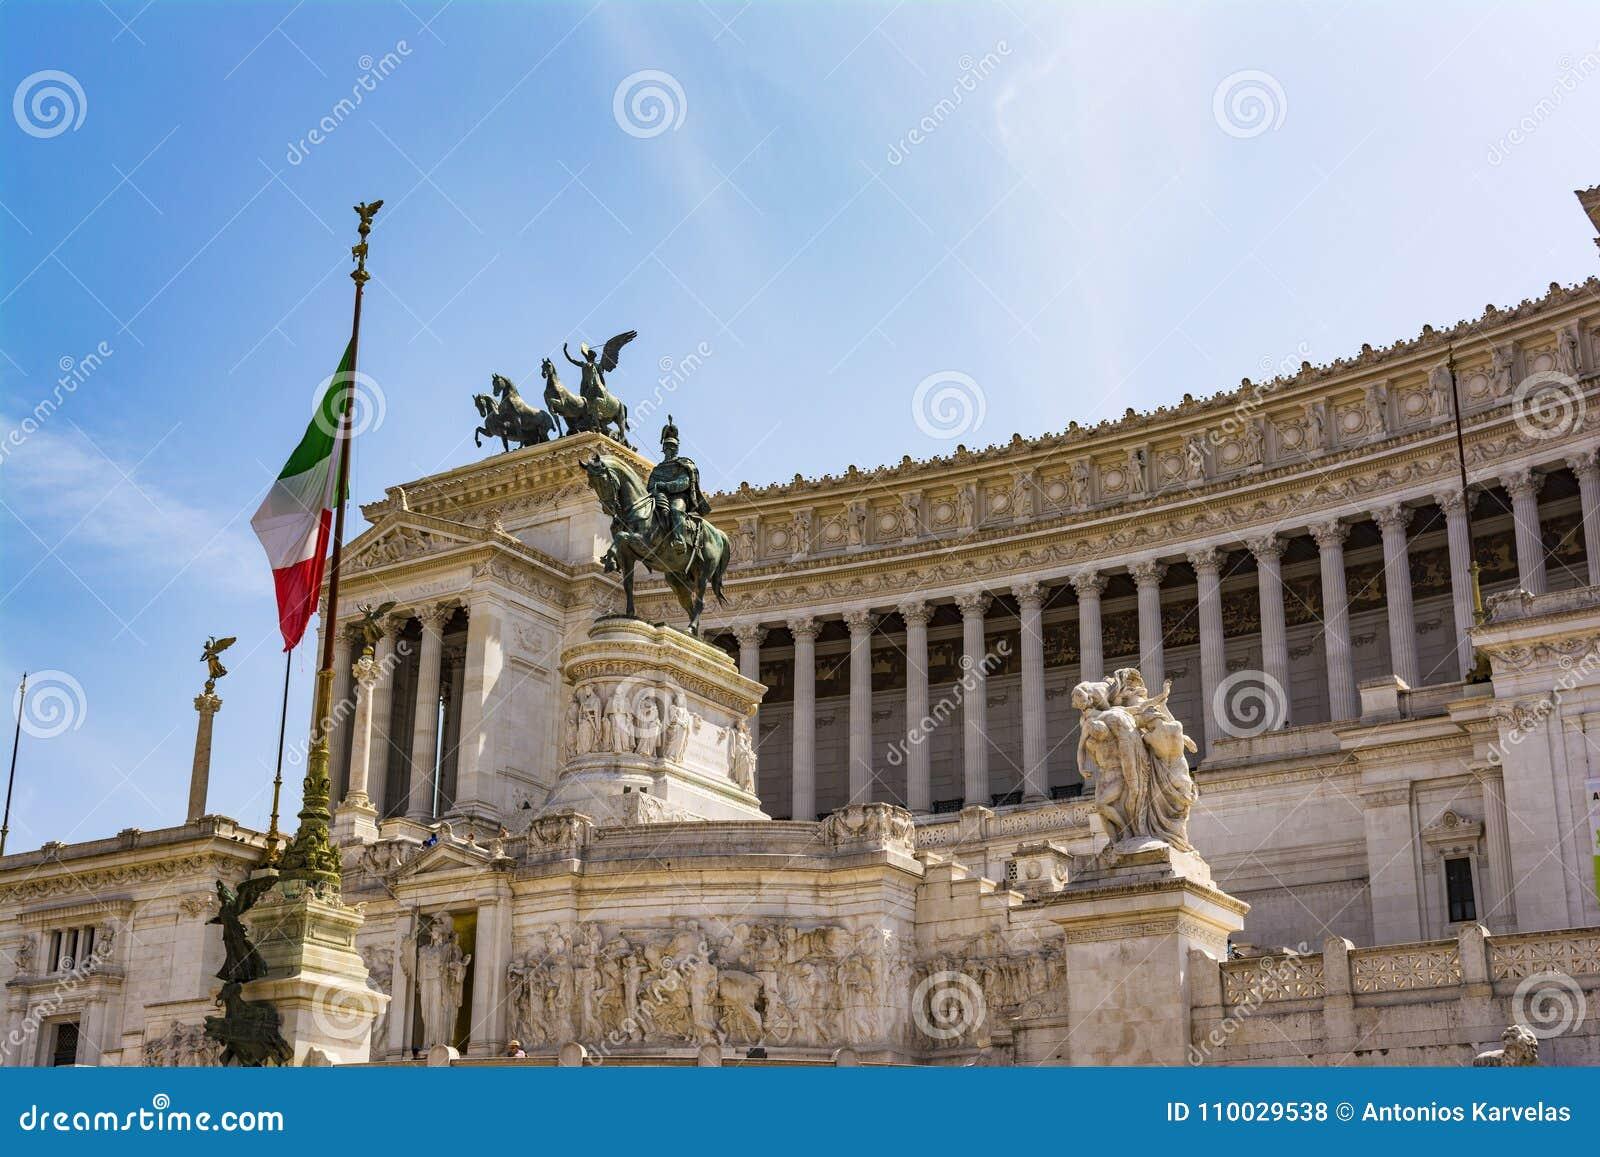 Mening van het nationale monument Vittorio Emanuele II, Piazza Venezia in Rome, Italië